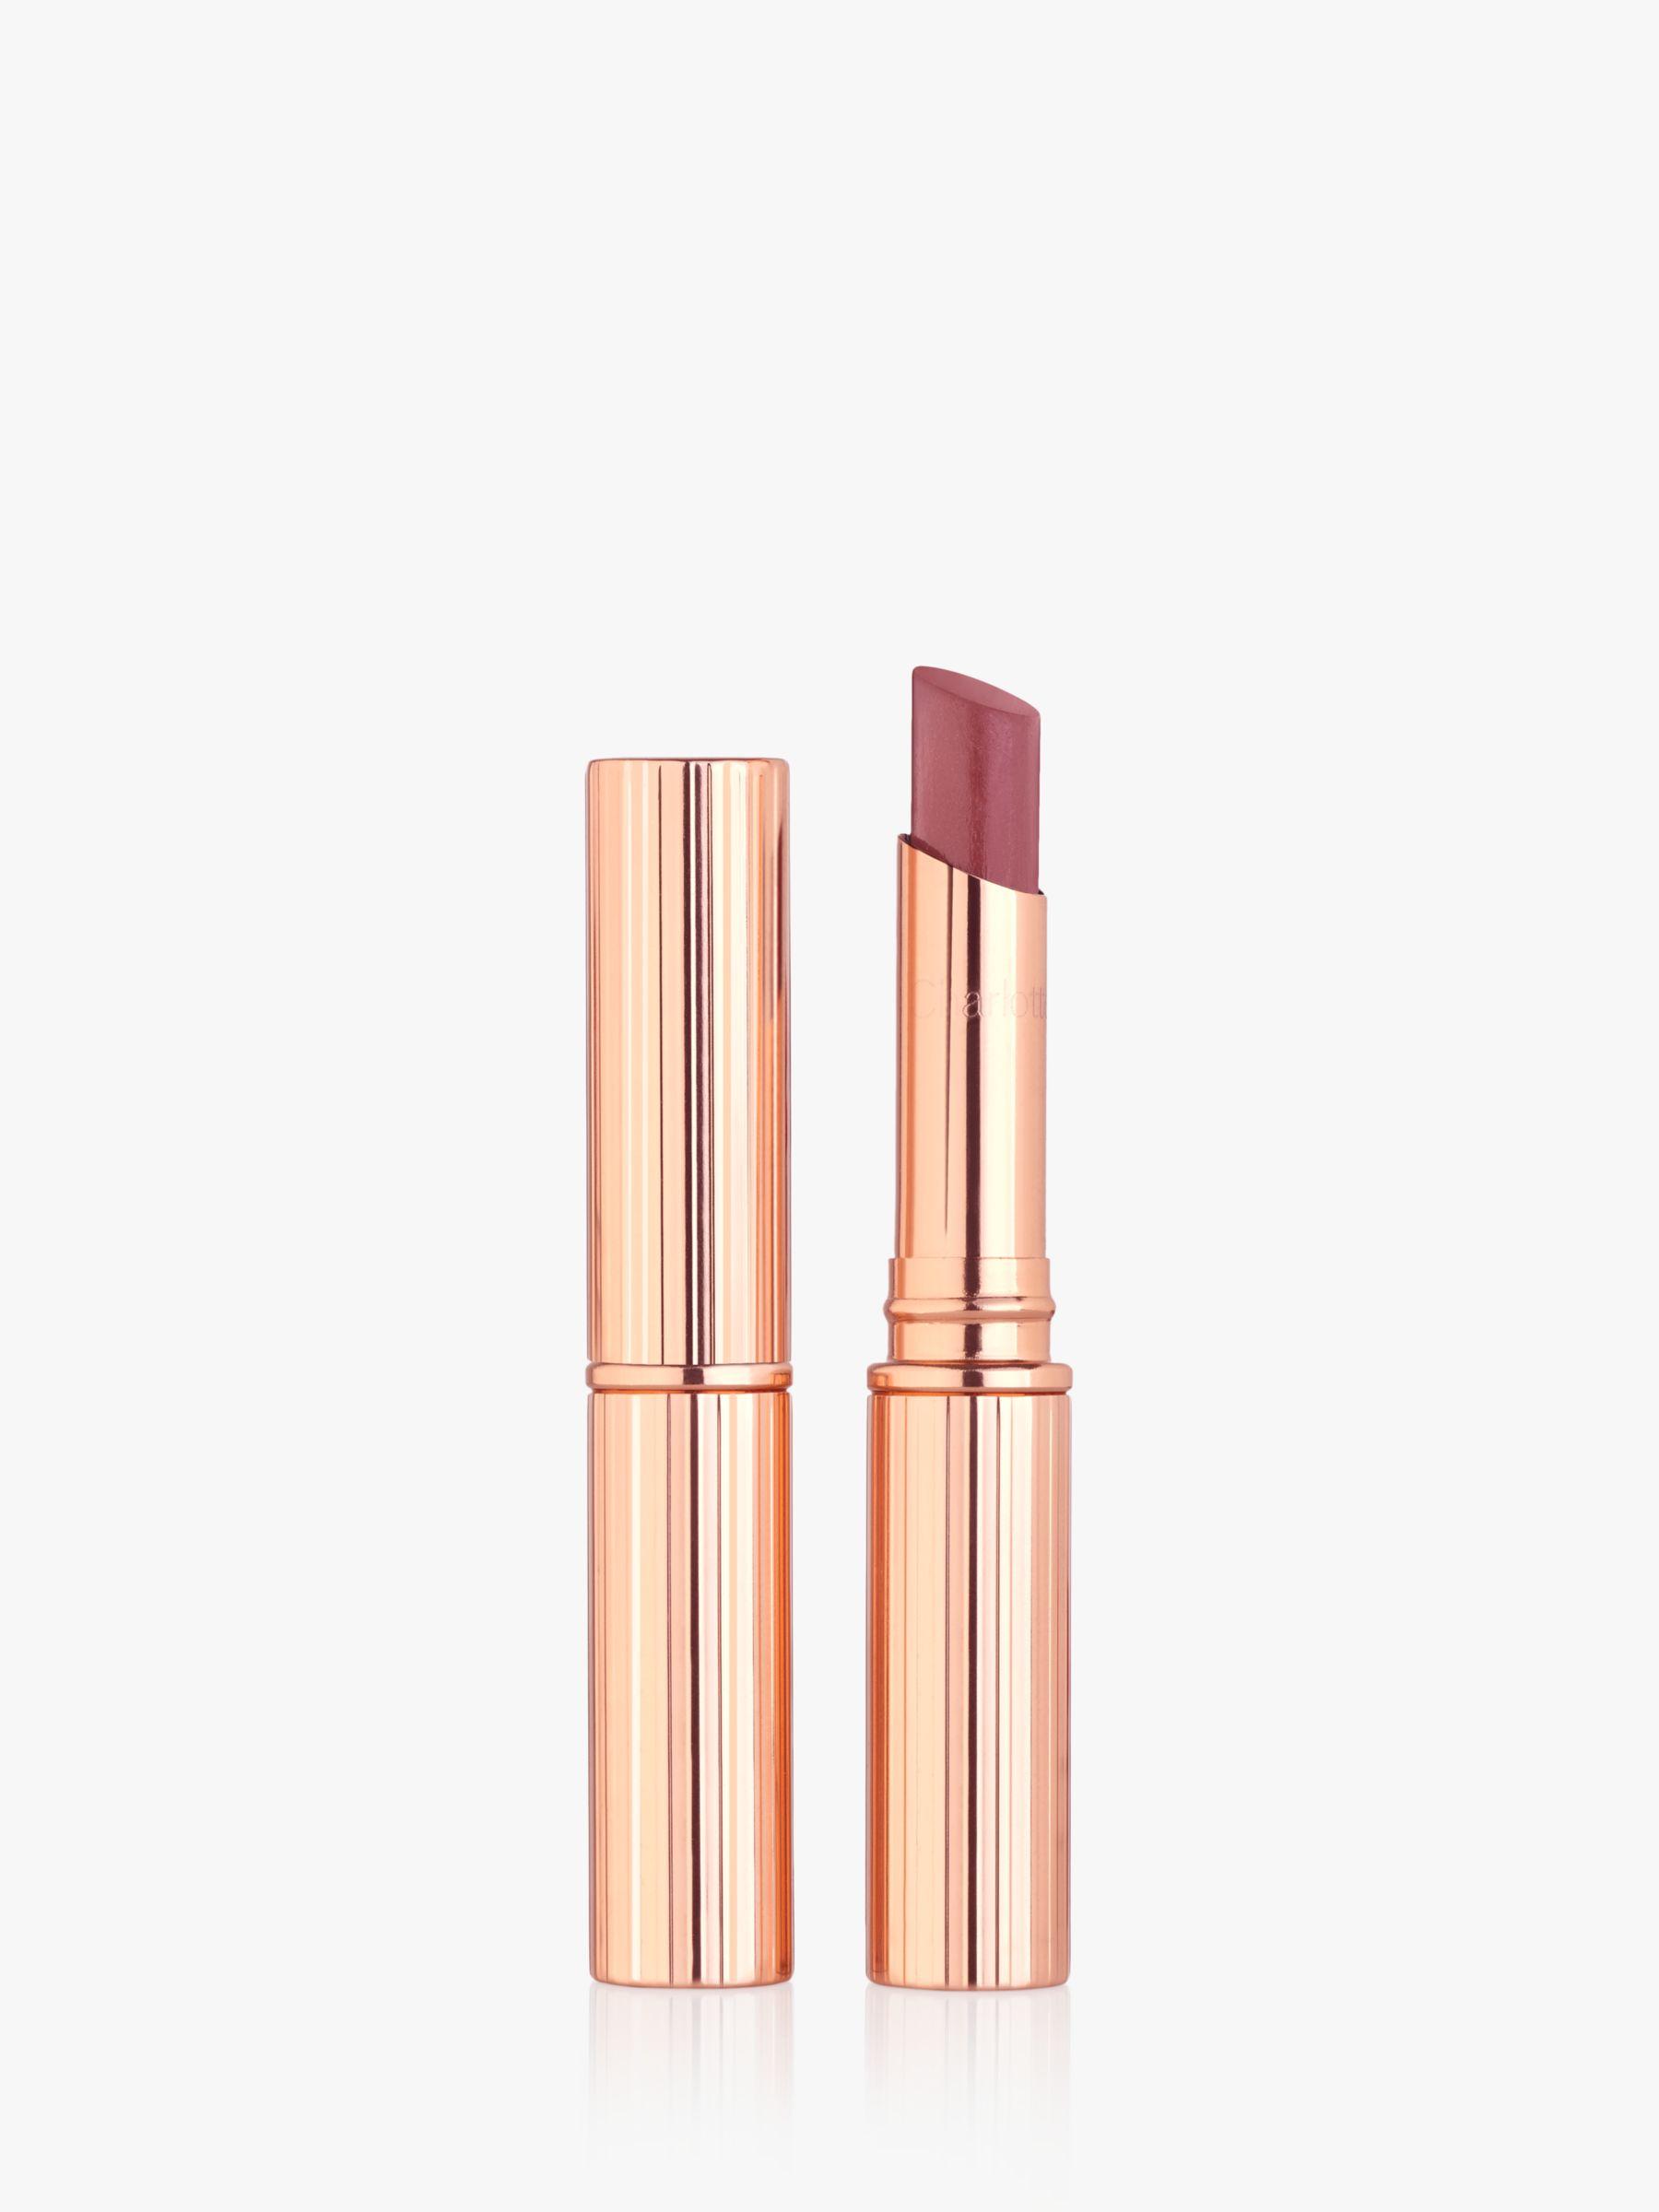 Charlotte Tilbury Charlotte Tilbury Superstar Lips Lipstick, Pillow Talk